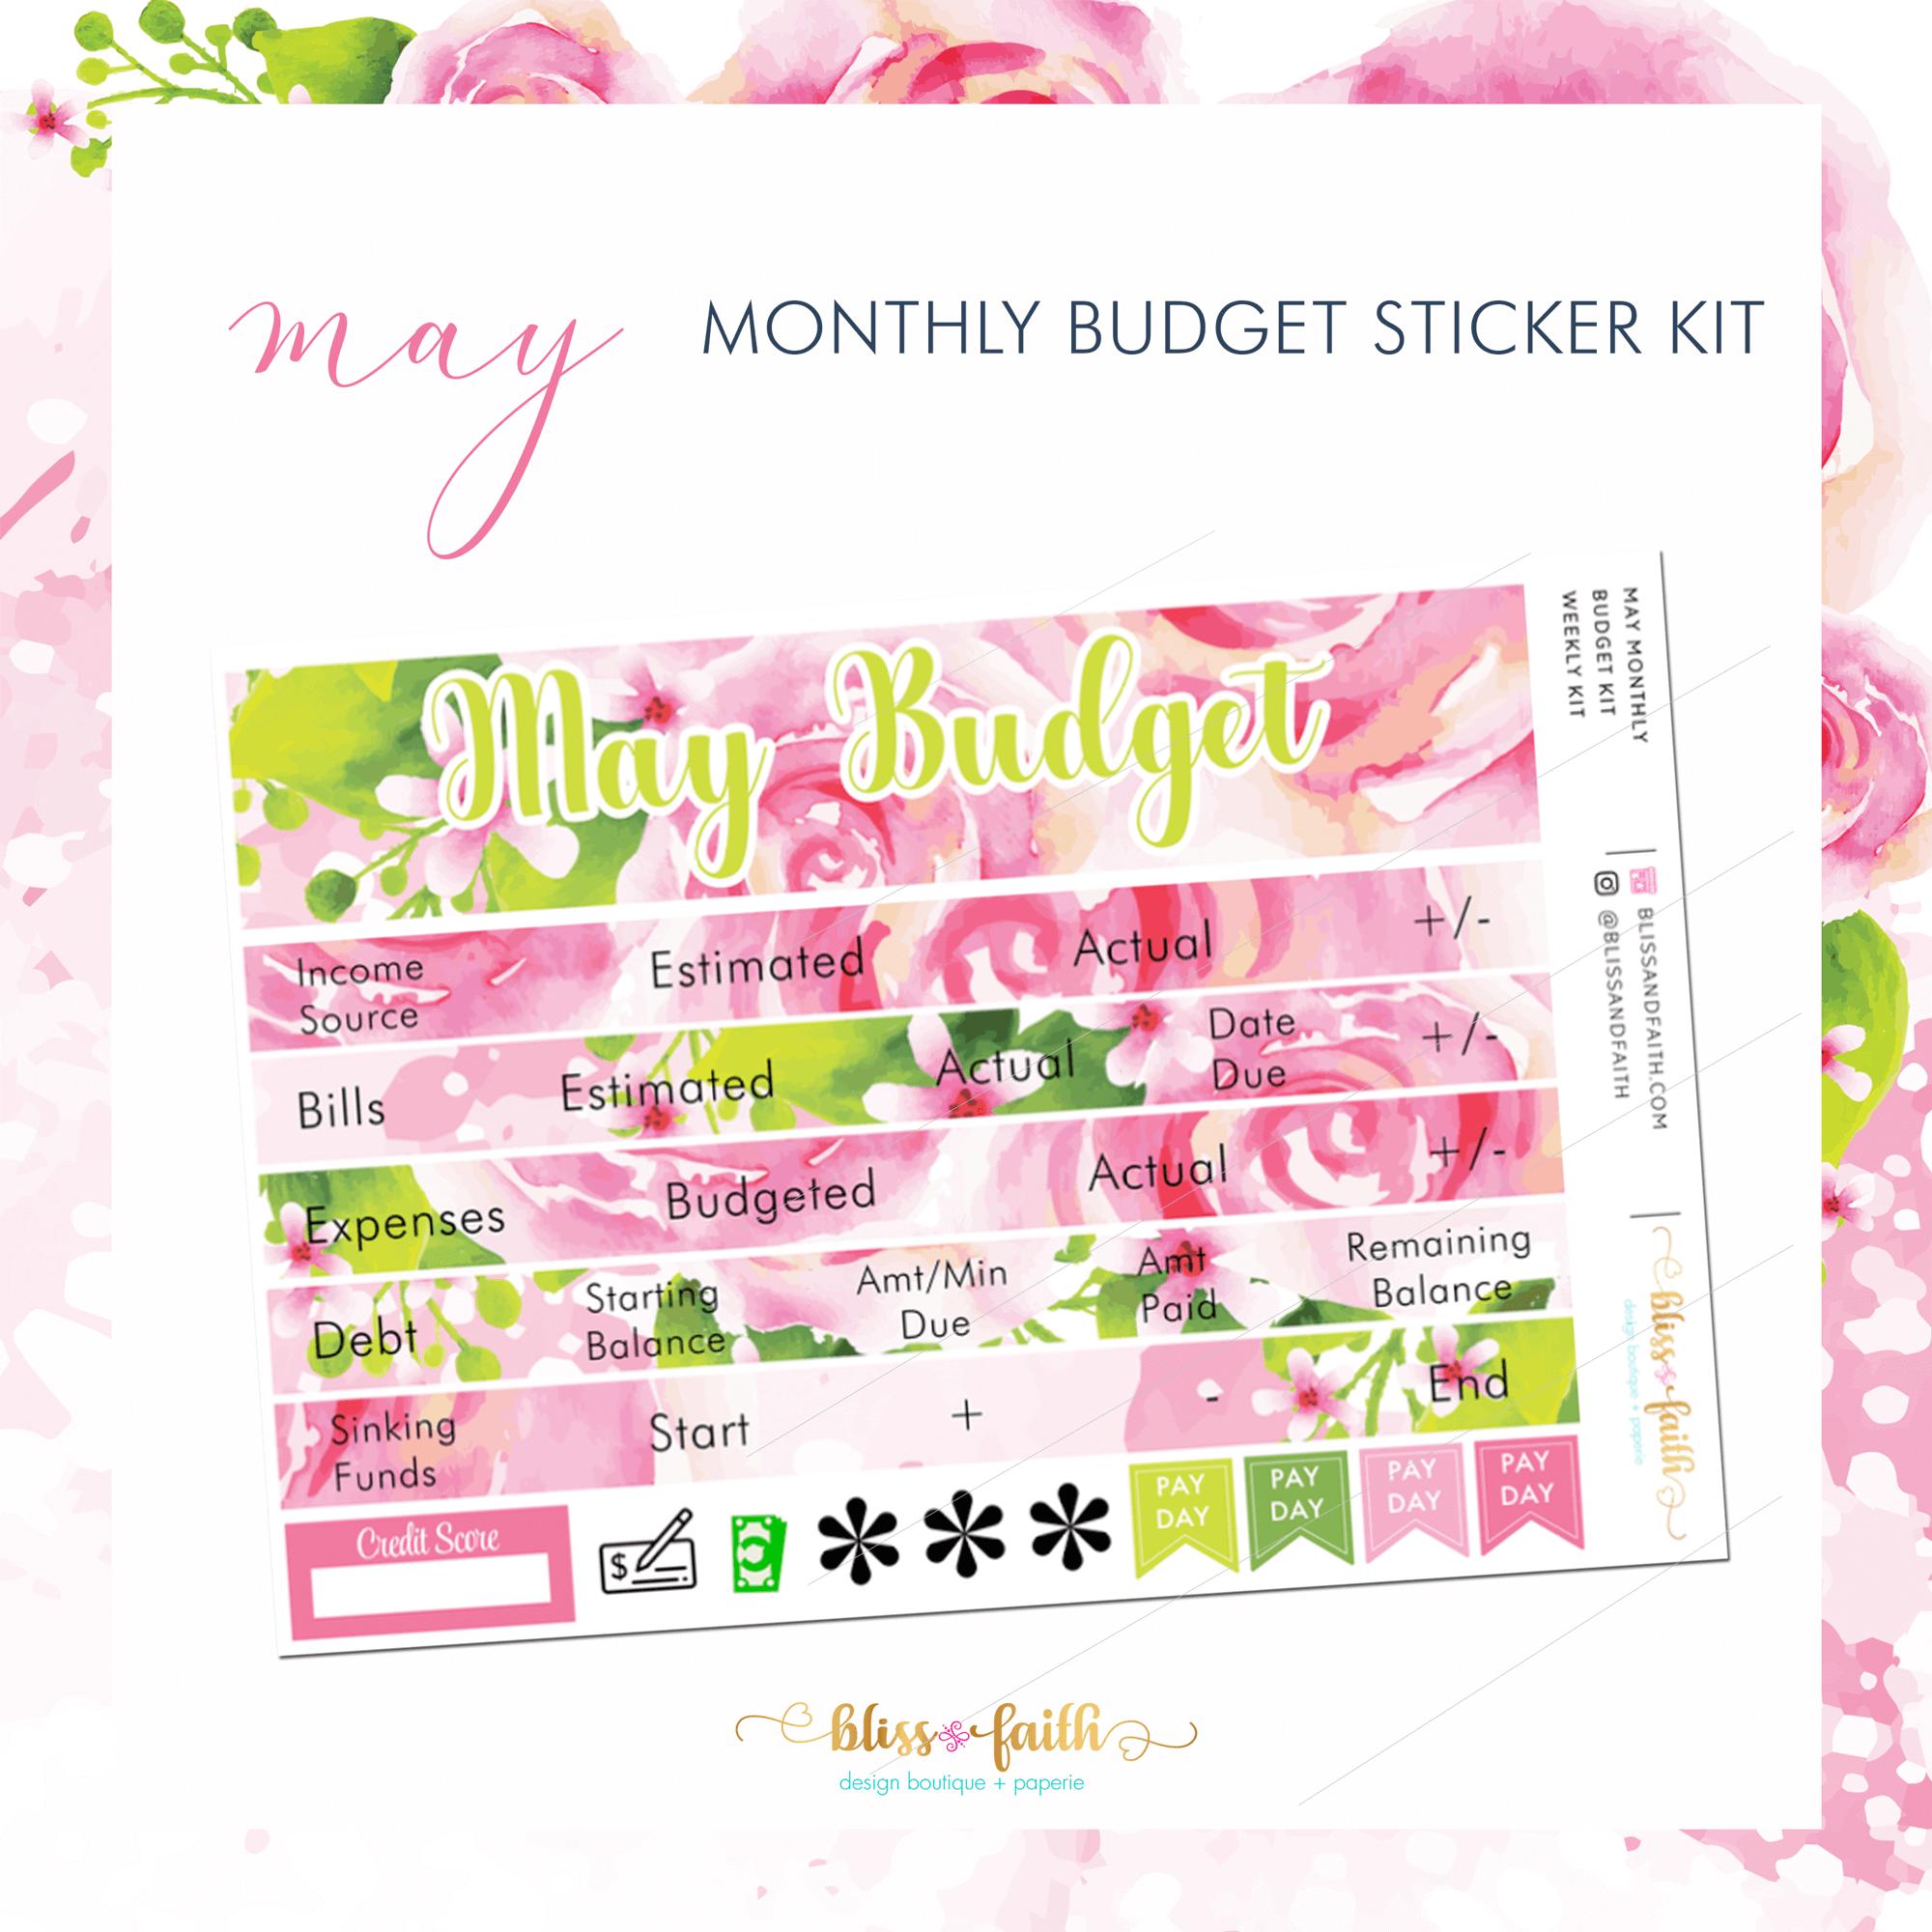 April Monthly Budget Sticker Kit | BlissandFaith.com